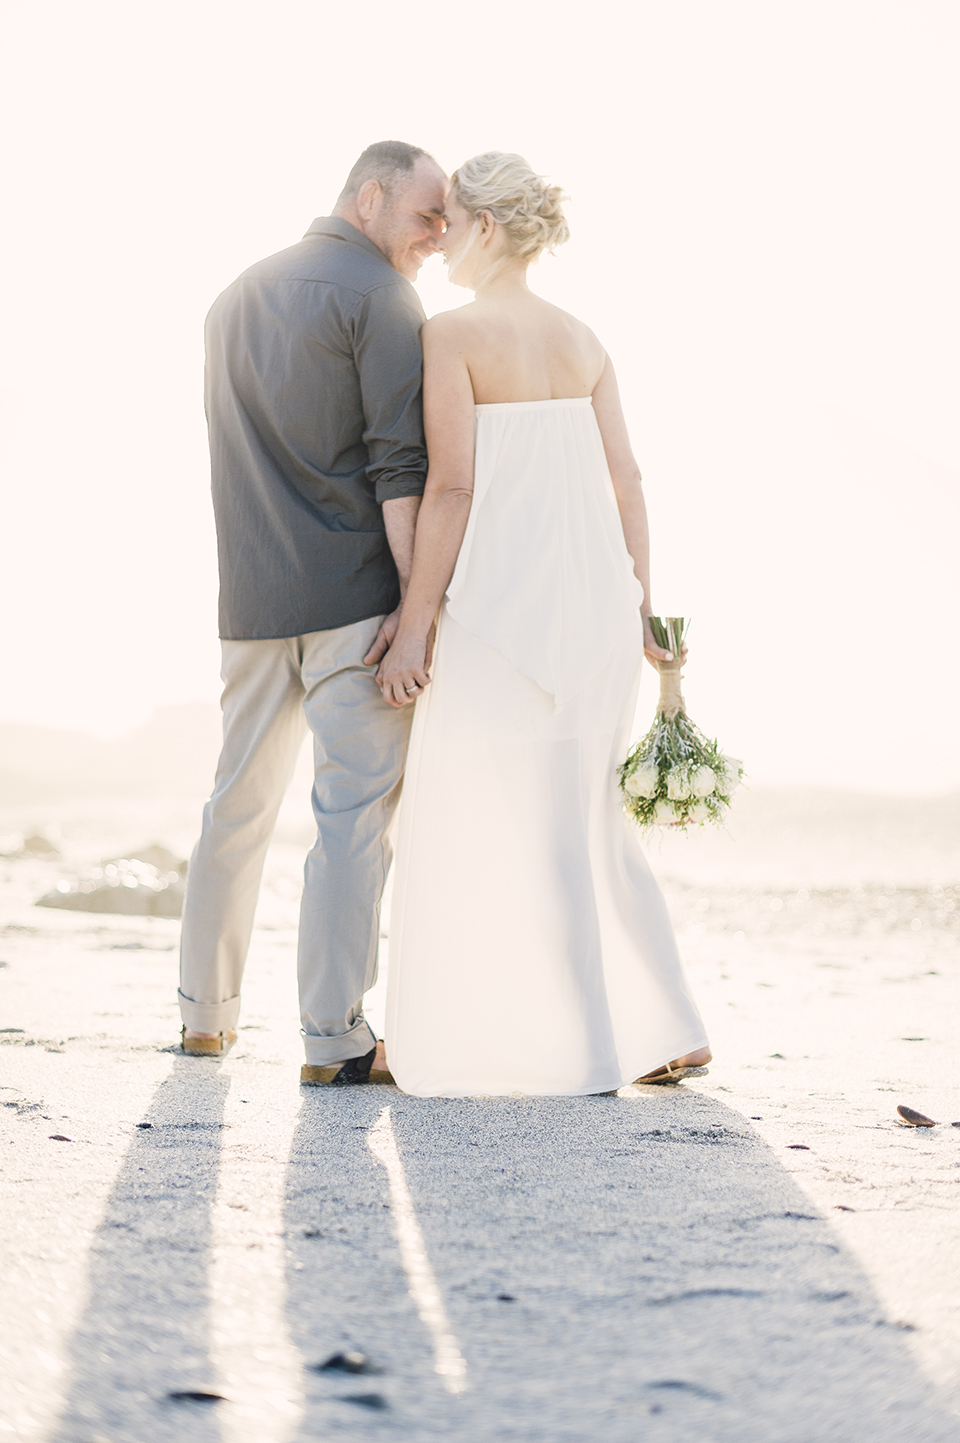 RyanParker_CapeTown_Photographer_Wedding_Hermanus_A&B_DSC_9474.jpg